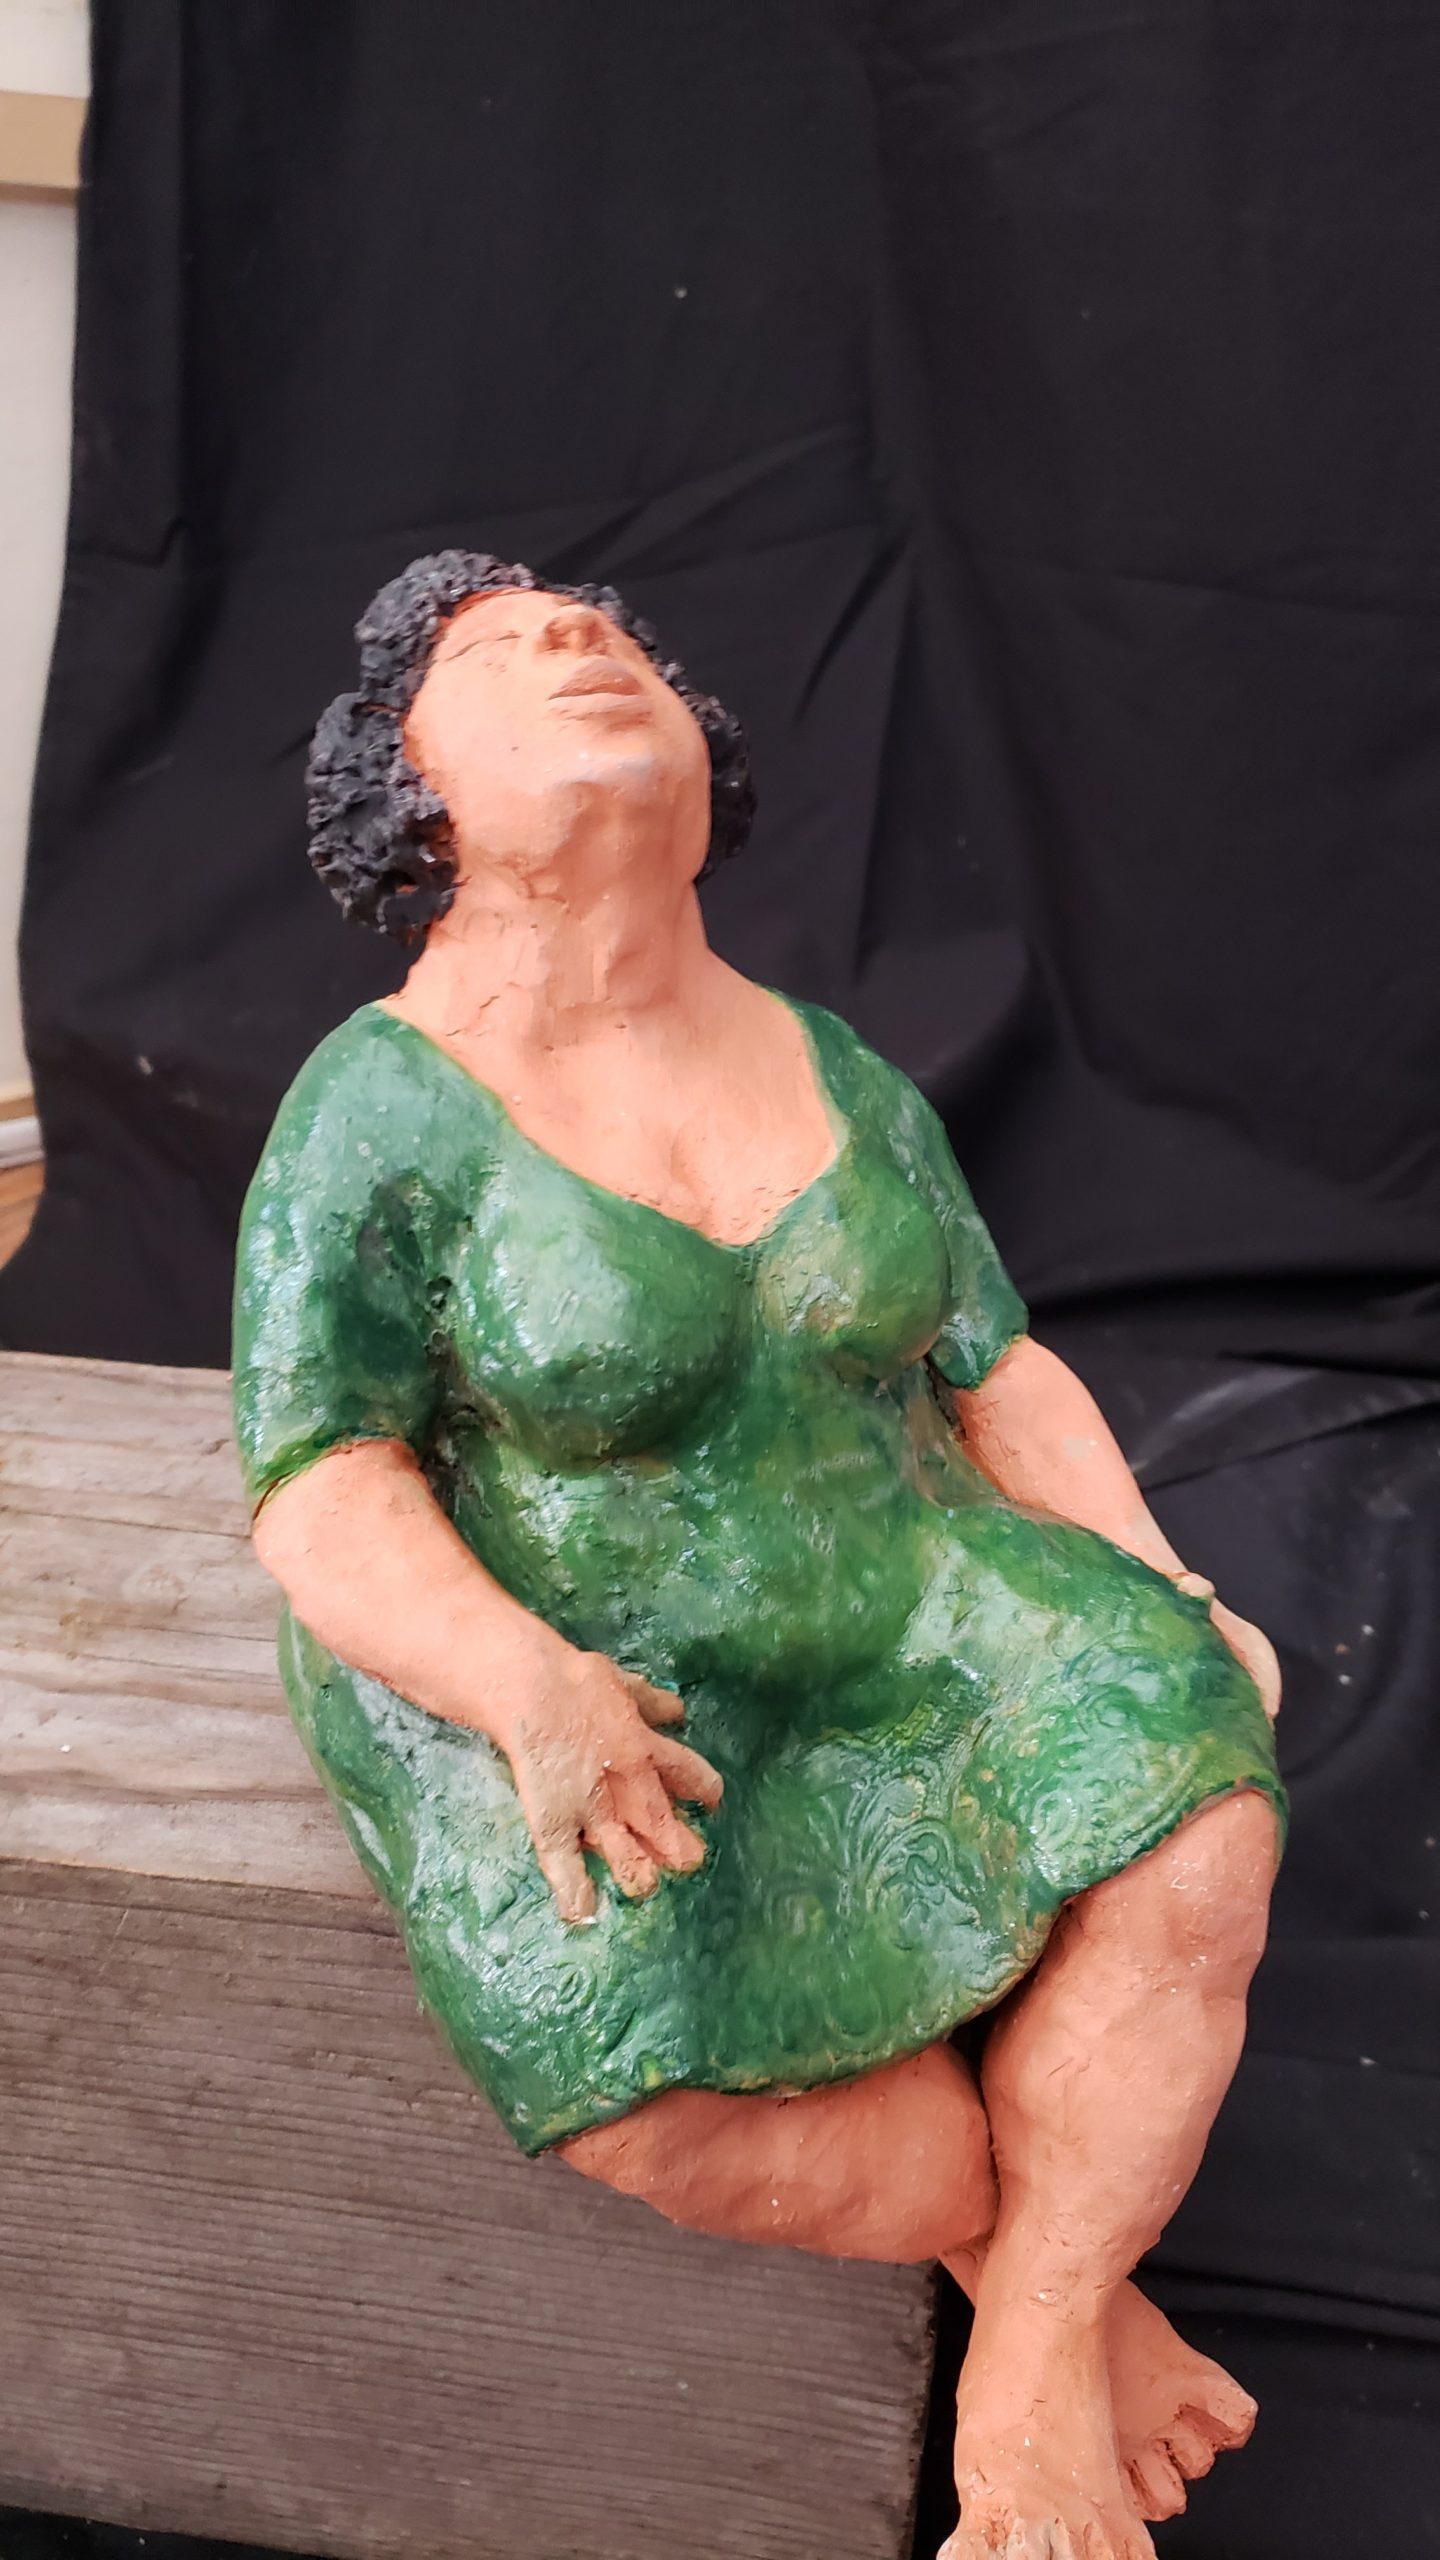 Woman in Green Dress by Marion Bartlett